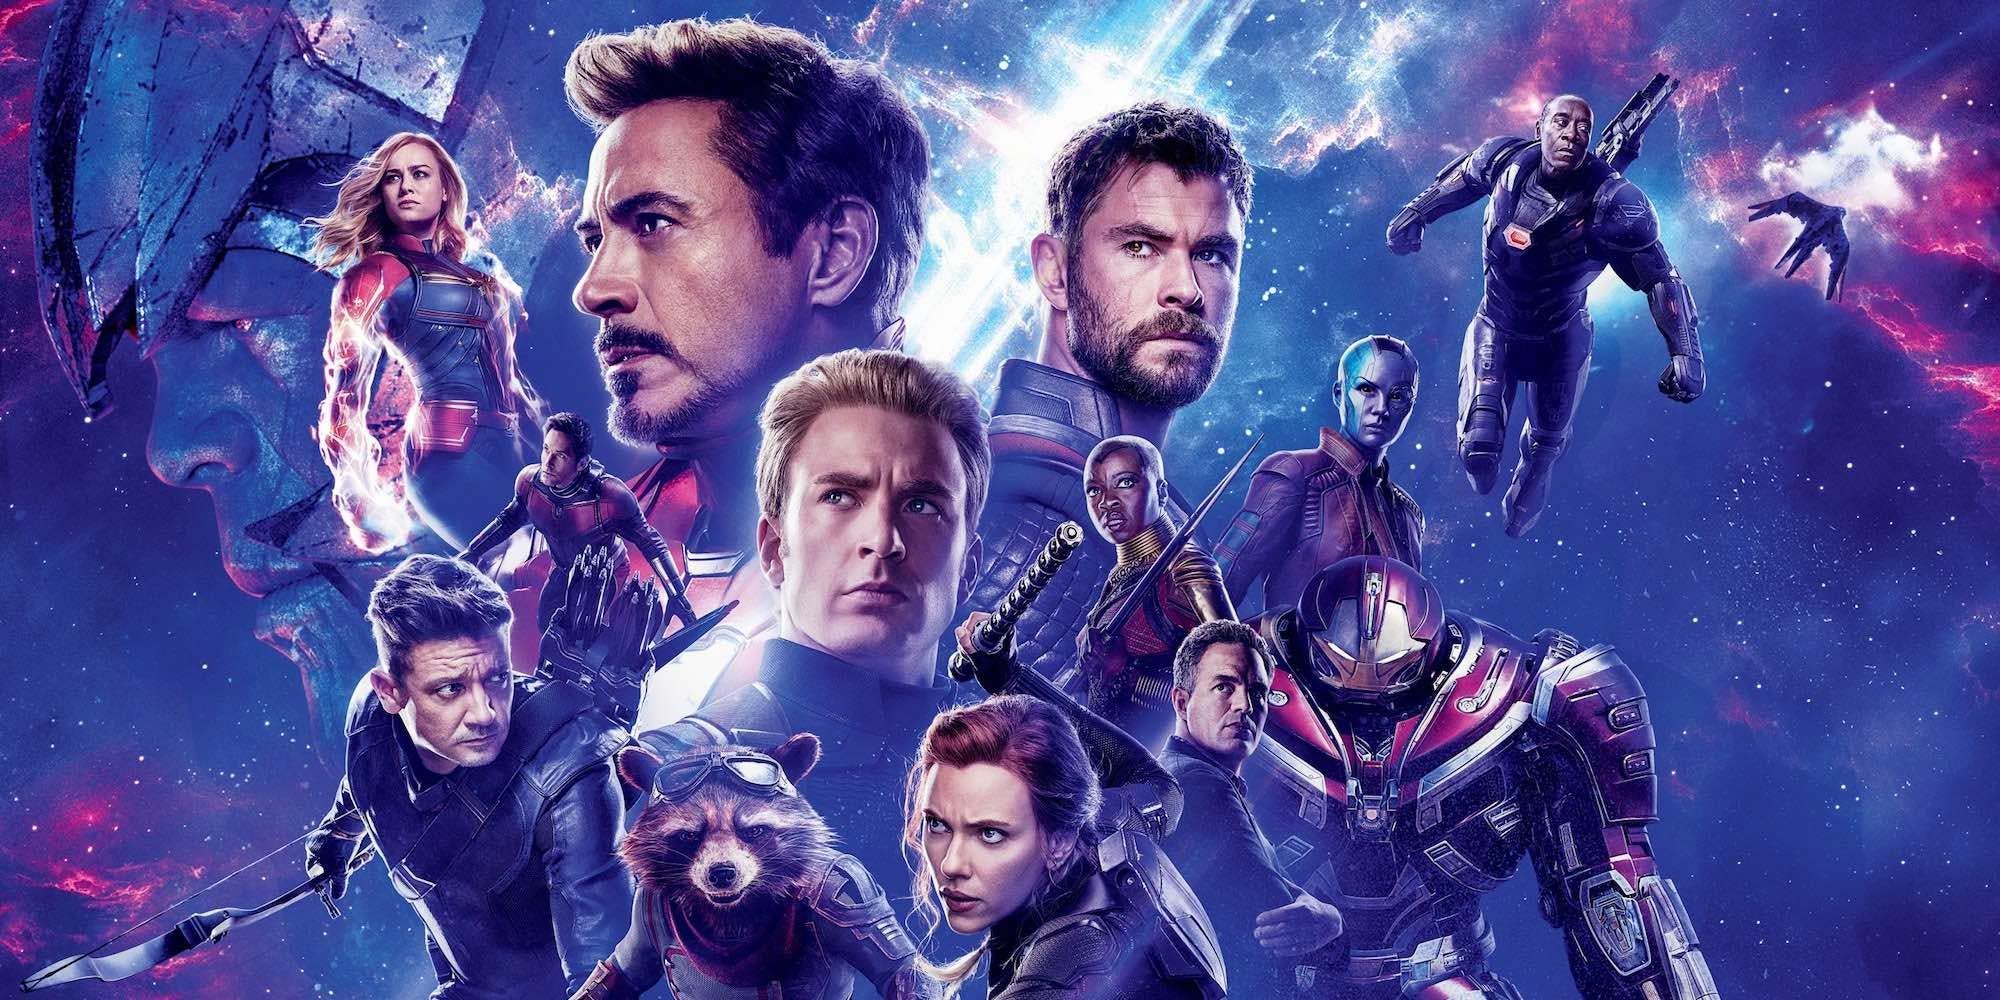 Avengers-Endgame-Poster-Cropped-MCU.jpg